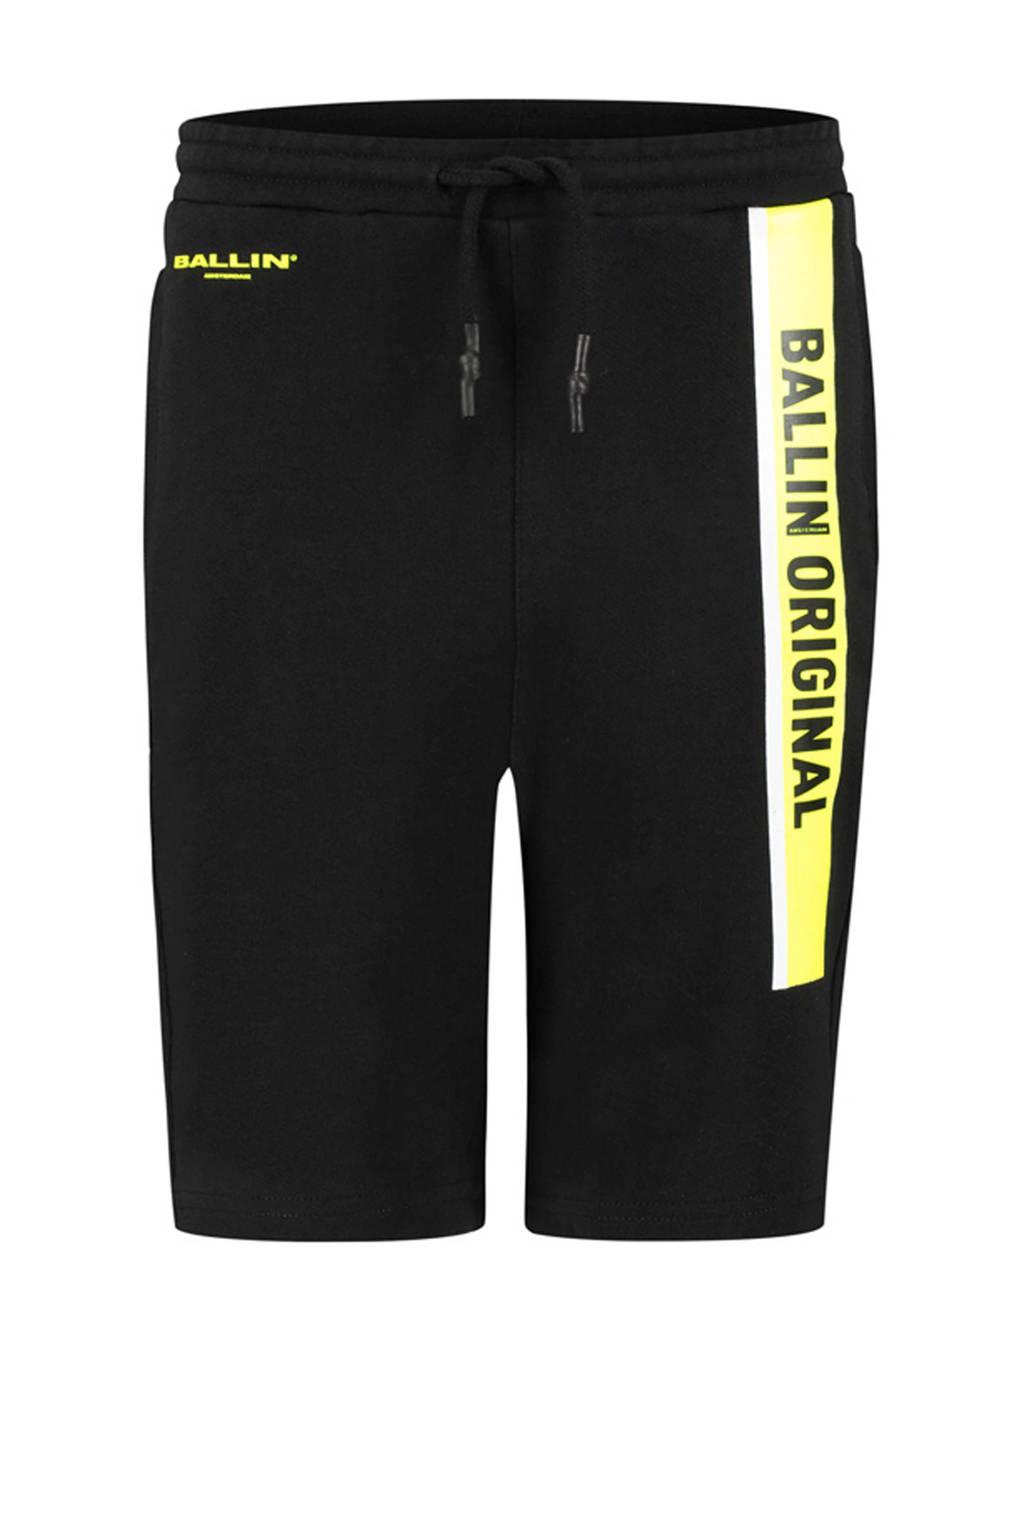 Ballin Amsterdam Junior by Purewhite sweatshort met tekst zwart/geel/wit, Zwart/geel/wit